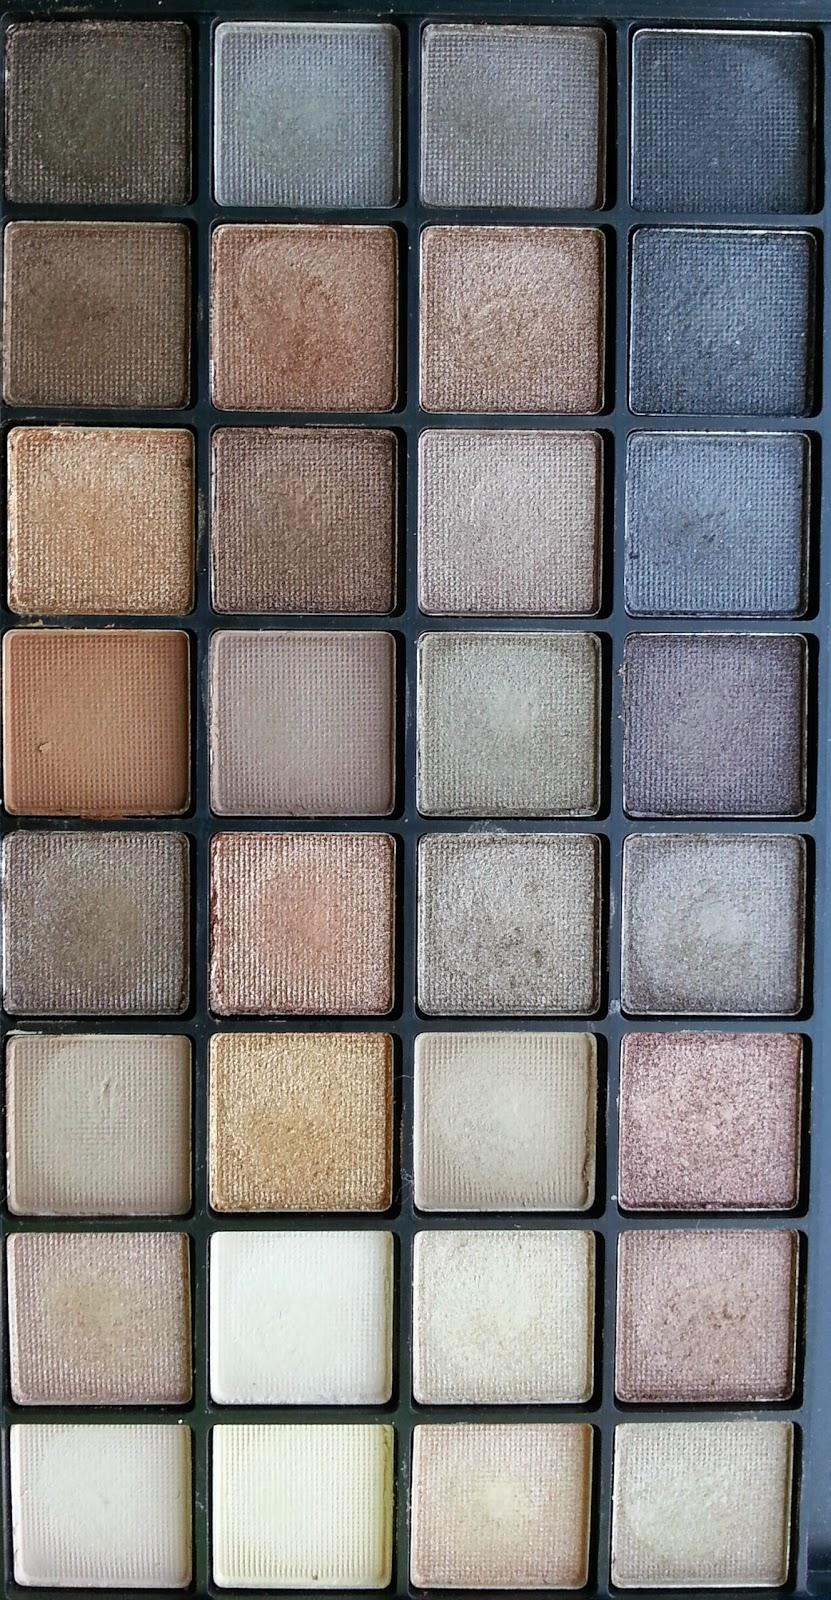 Elf Studio Endless Eyes Pro Mini Eyeshadow Palette Natural Review